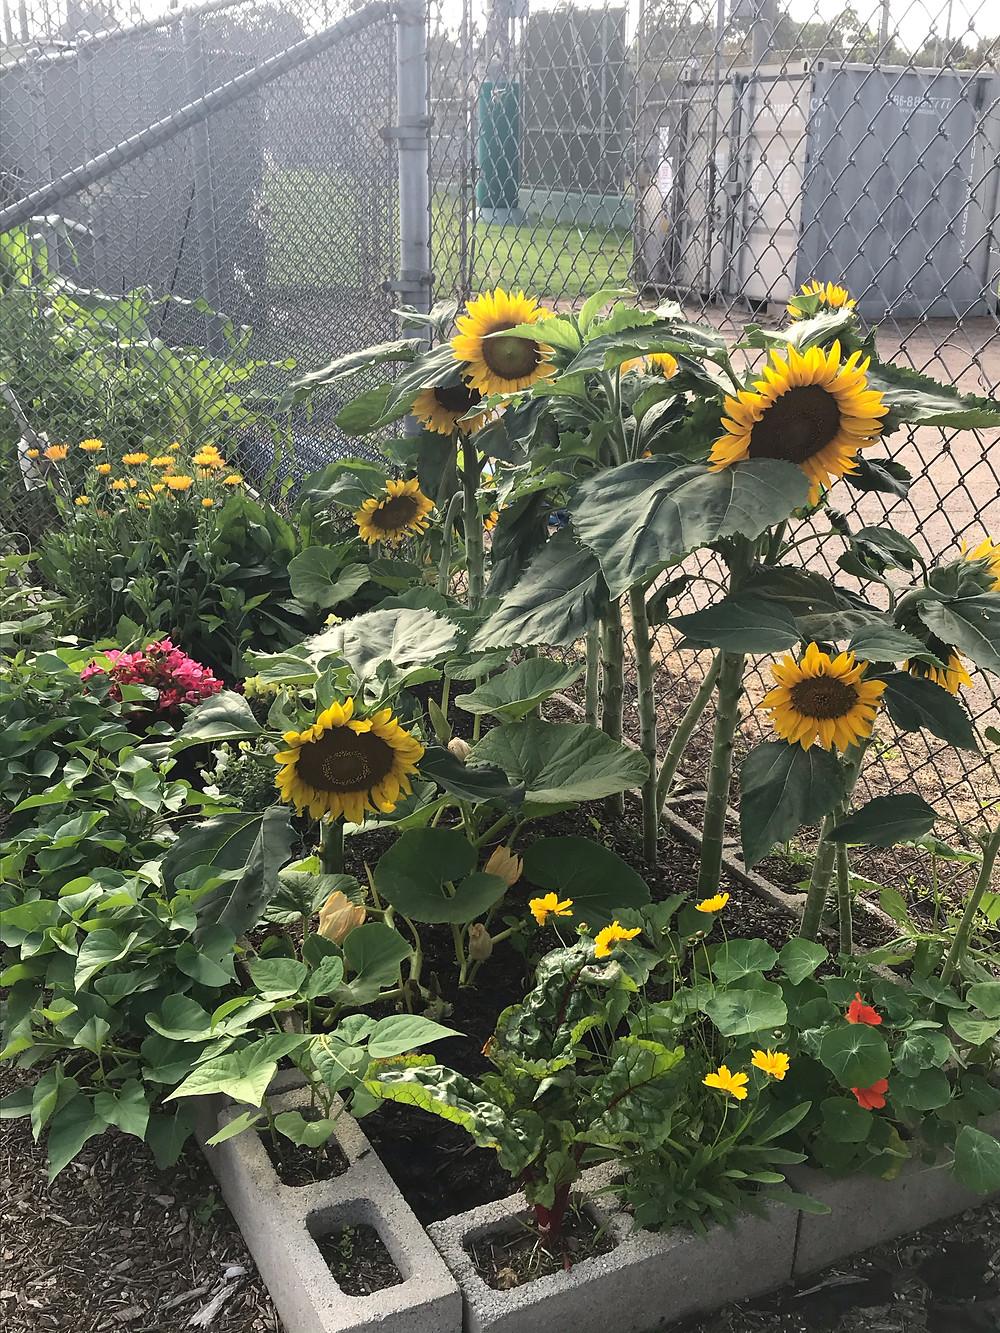 About half a dozen sunflowers stand 3 to 4 feet high in a community garden plot.